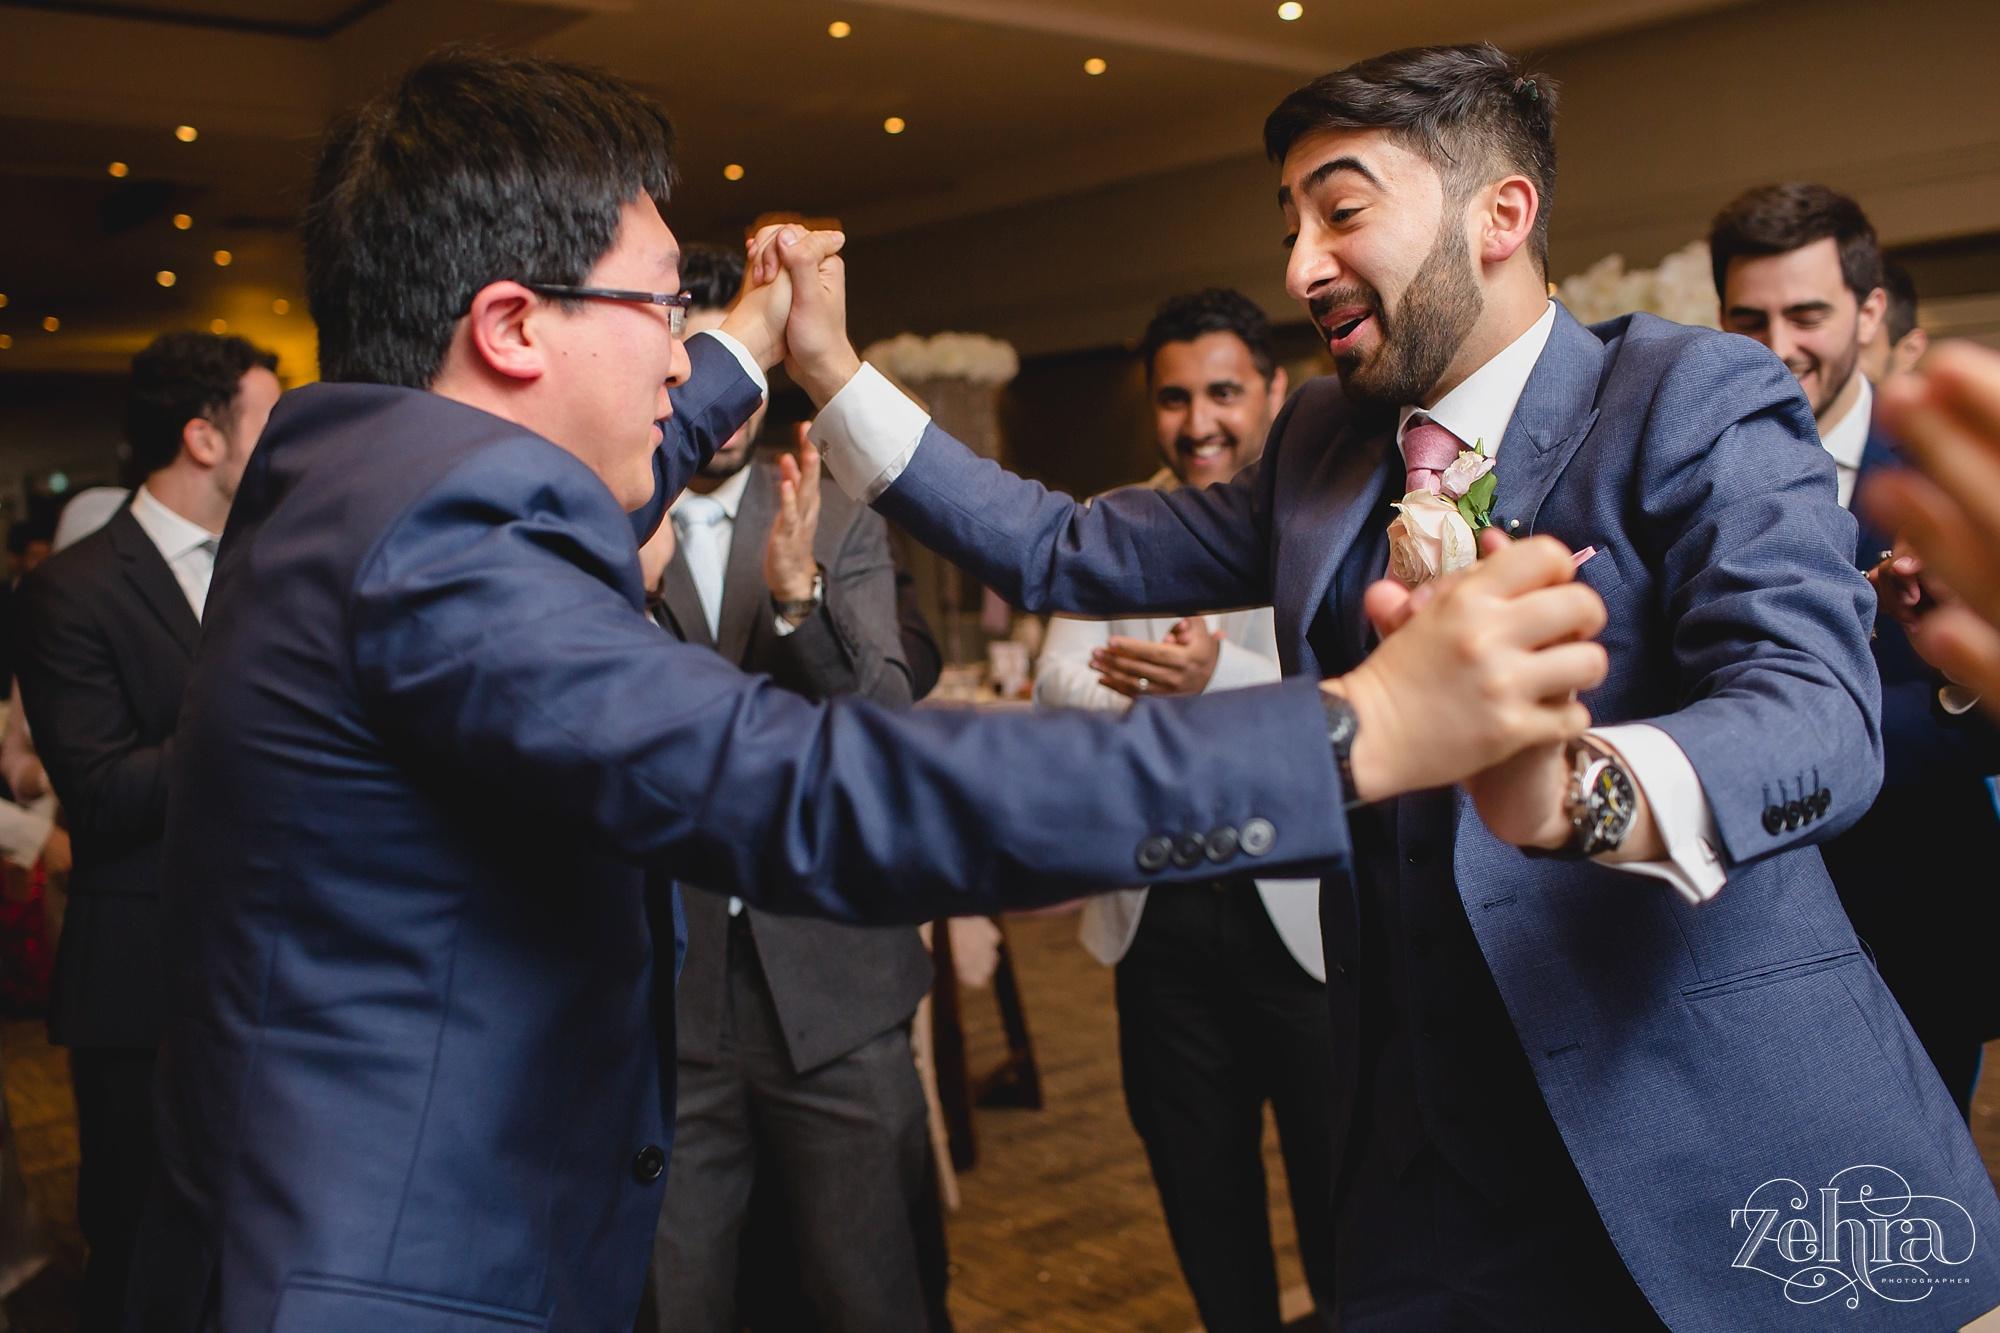 zehra photographer mere cheshire wedding_0035.jpg